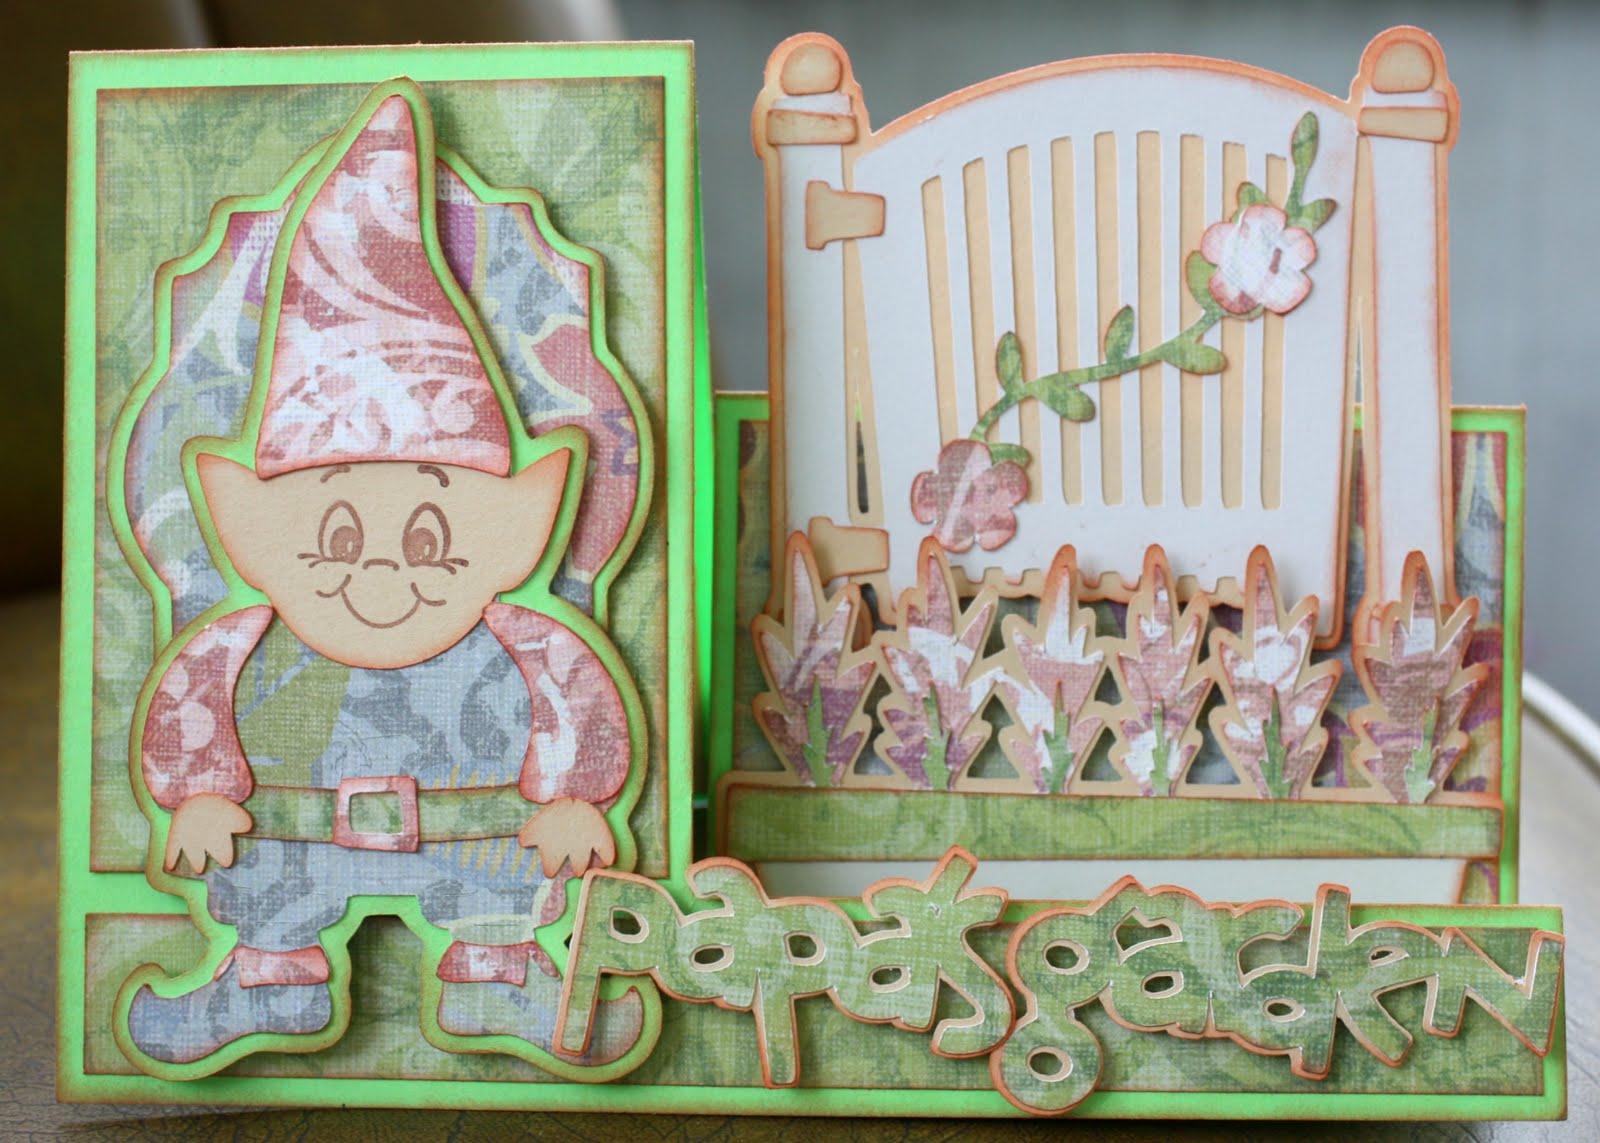 http://4.bp.blogspot.com/-48bFvKKOE54/TfkoAgfGtmI/AAAAAAAAAgM/UBjCTgPy6dI/s1600/gnome.jpg